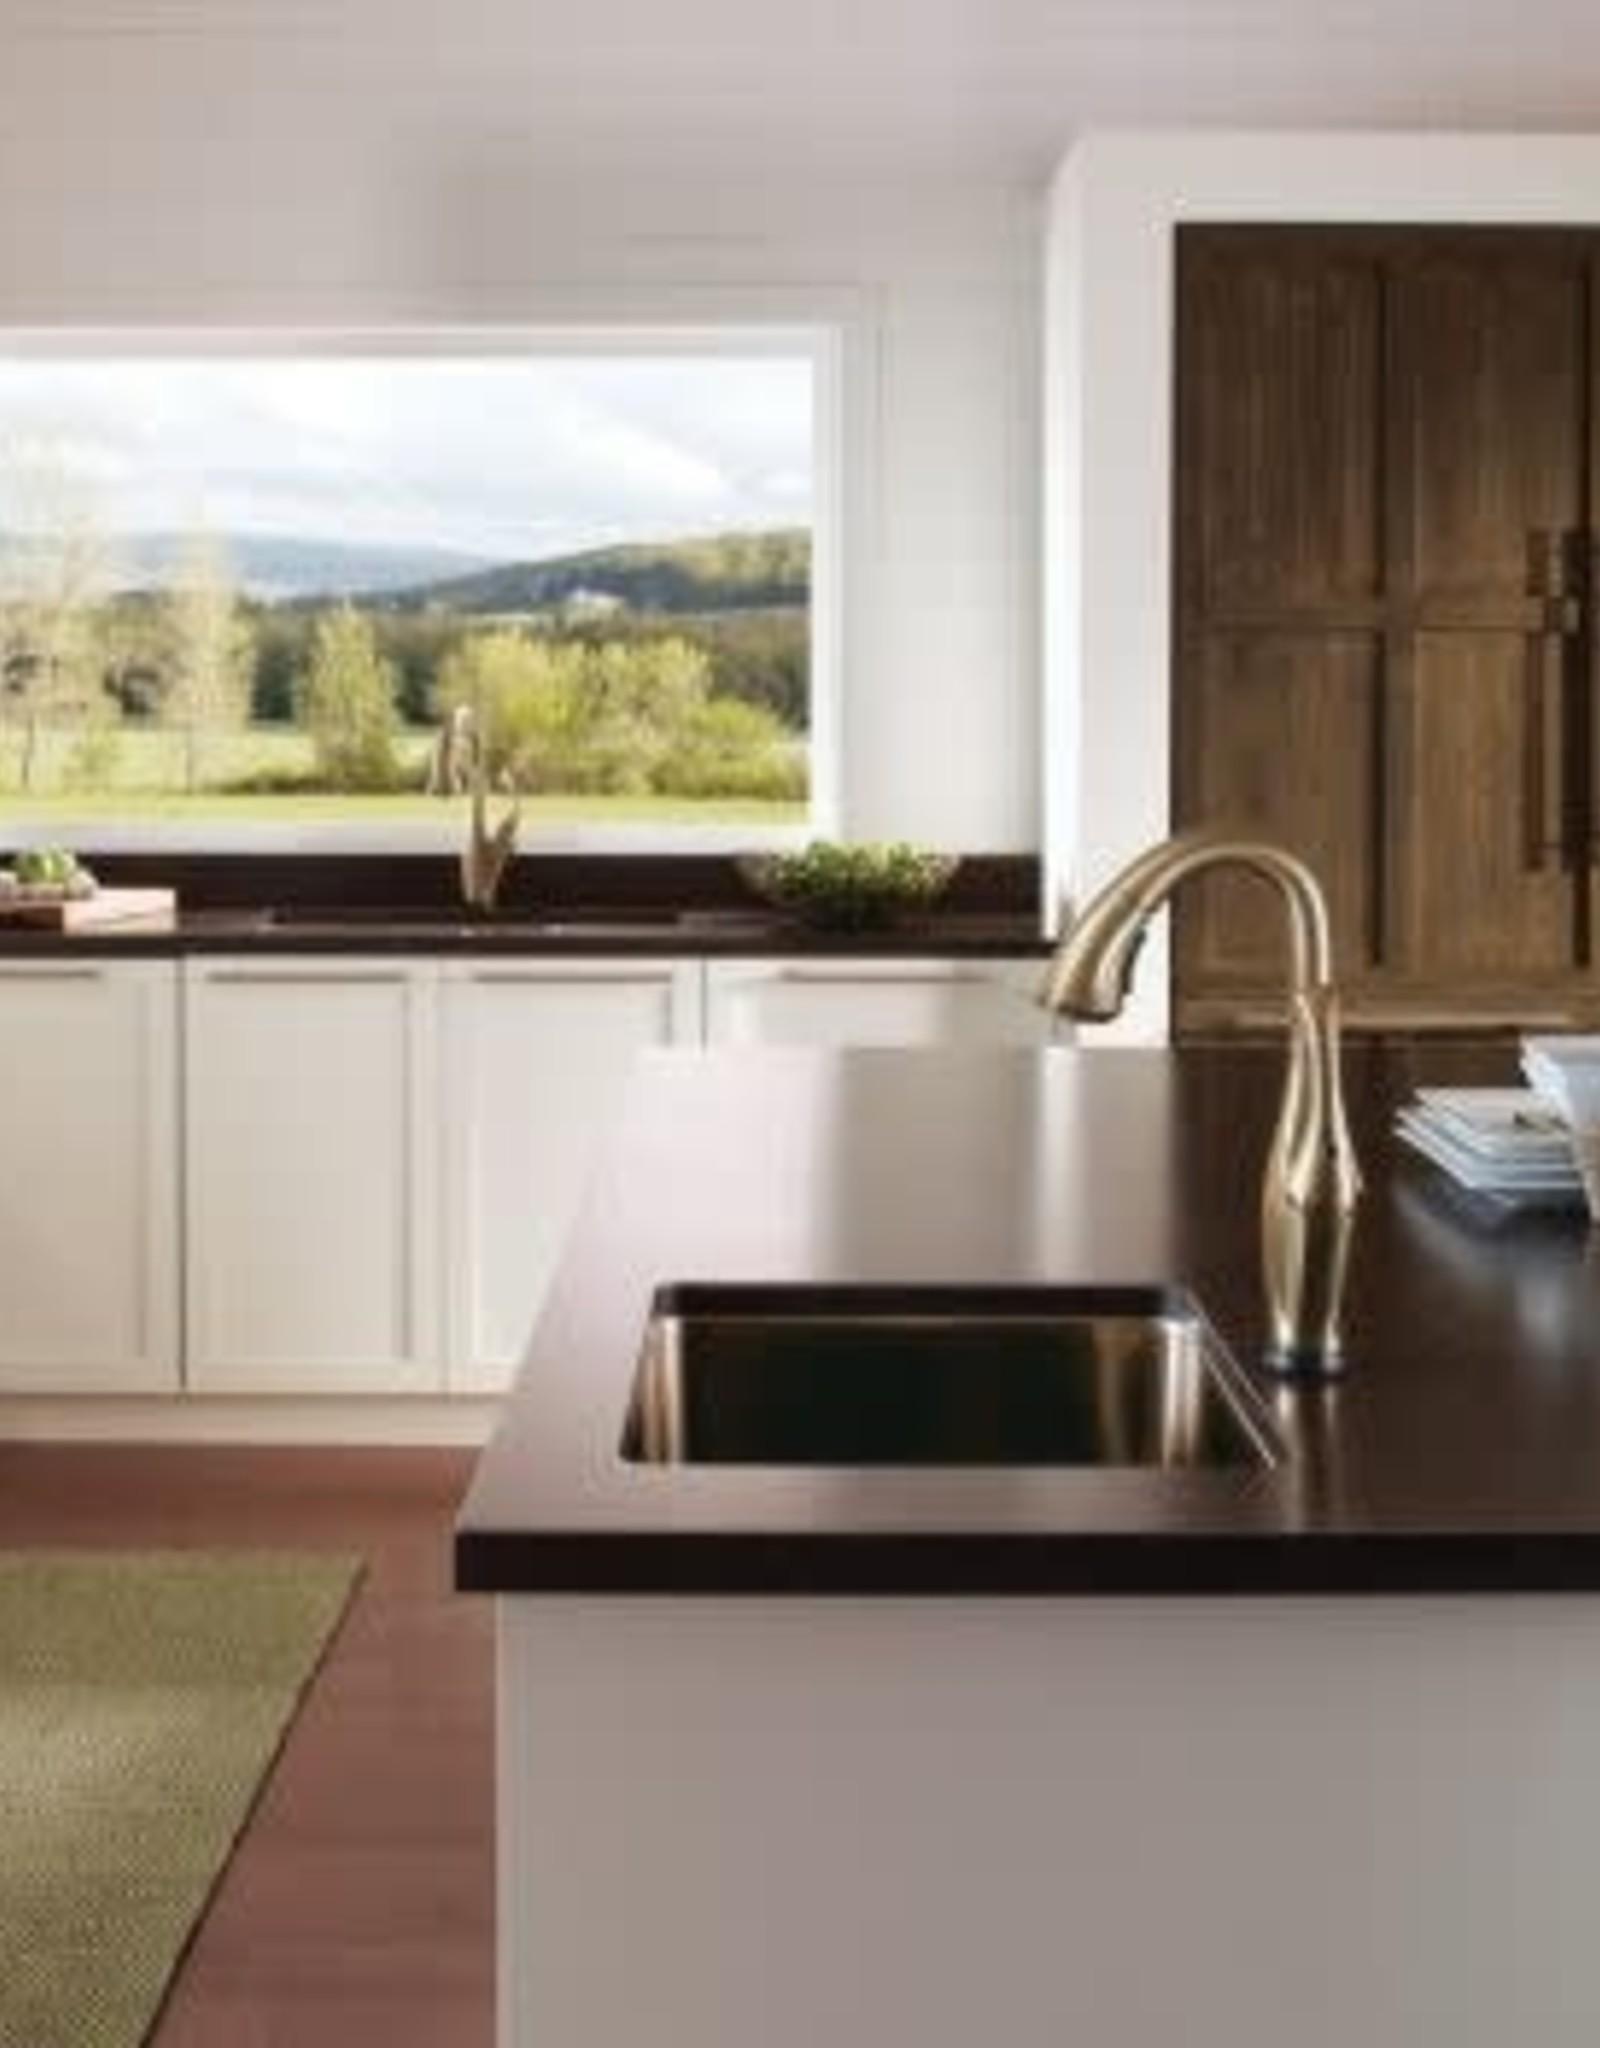 delta delta addison kitchen faucet w touch champagne bronze